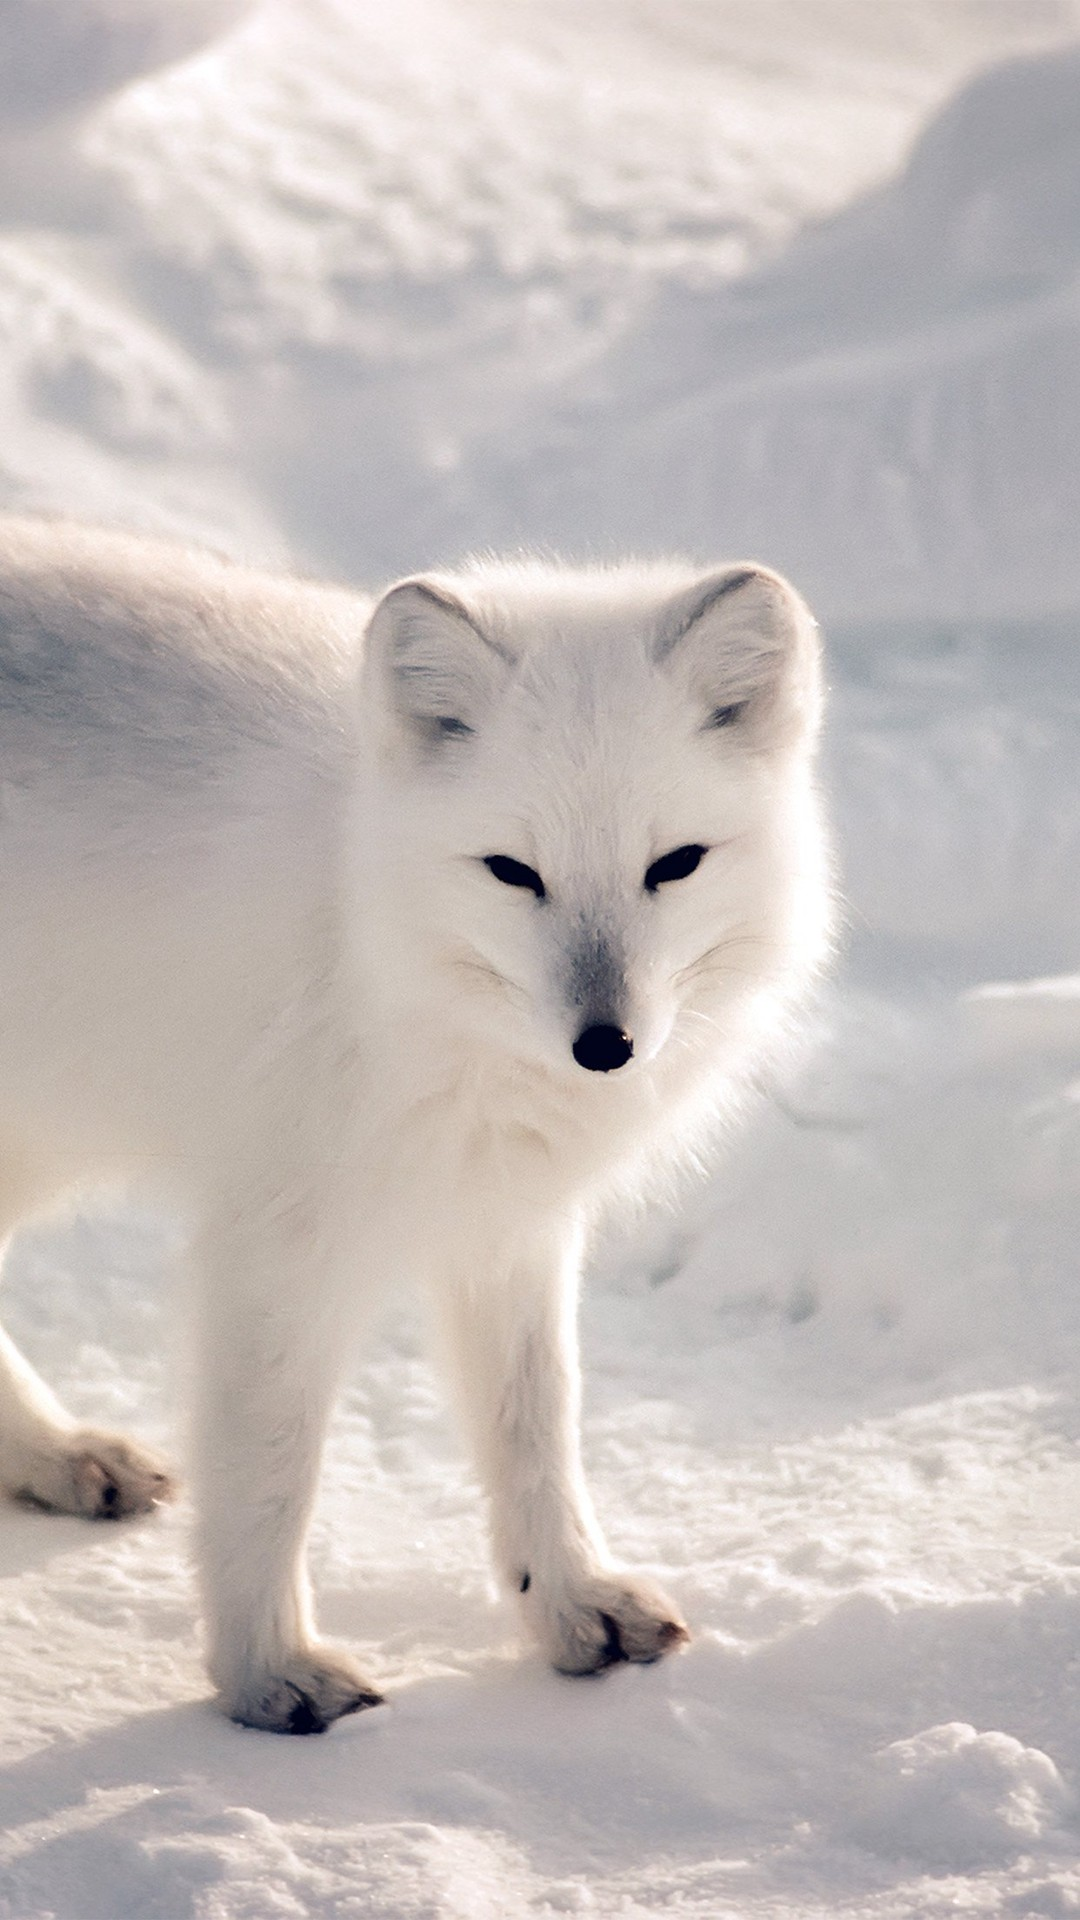 White Artic Fox Snow Winter Animal iPhone 6 wallpaper